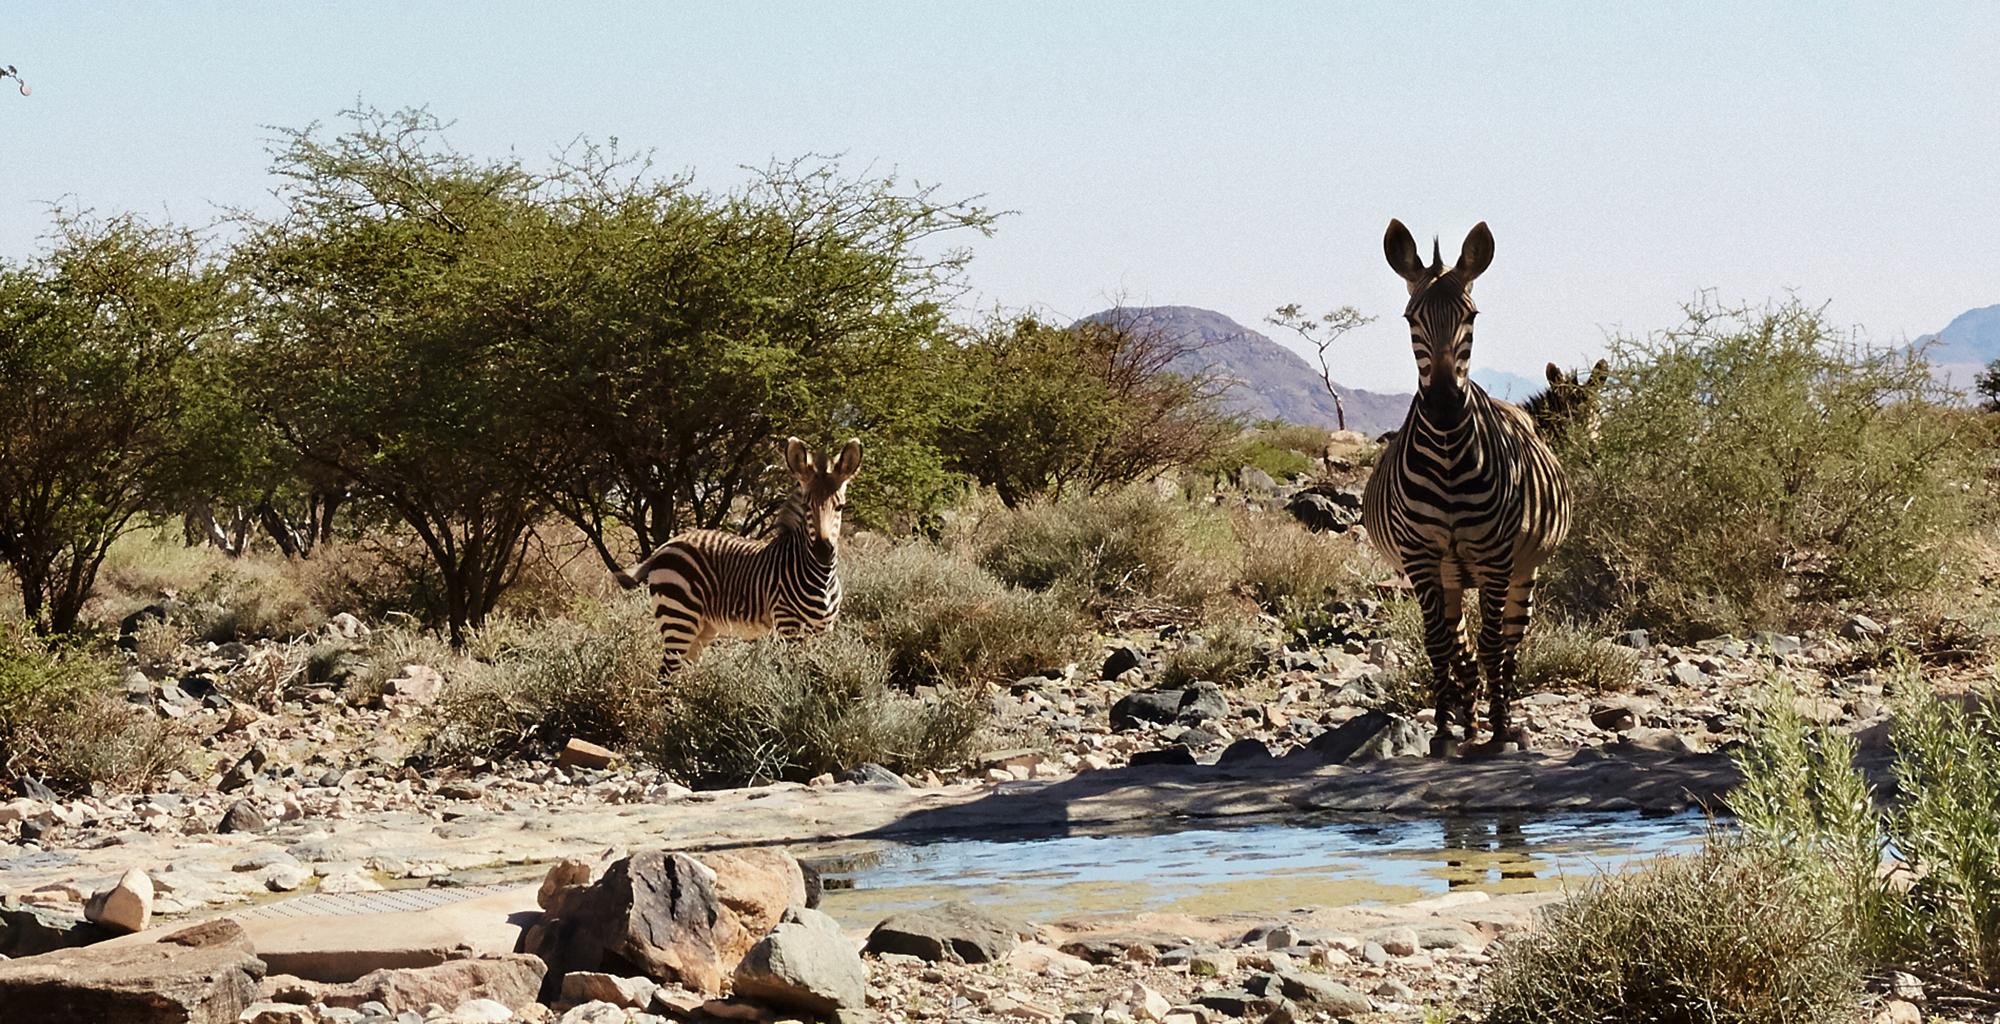 Namibia-Sossusvlei-Nest-Zebra